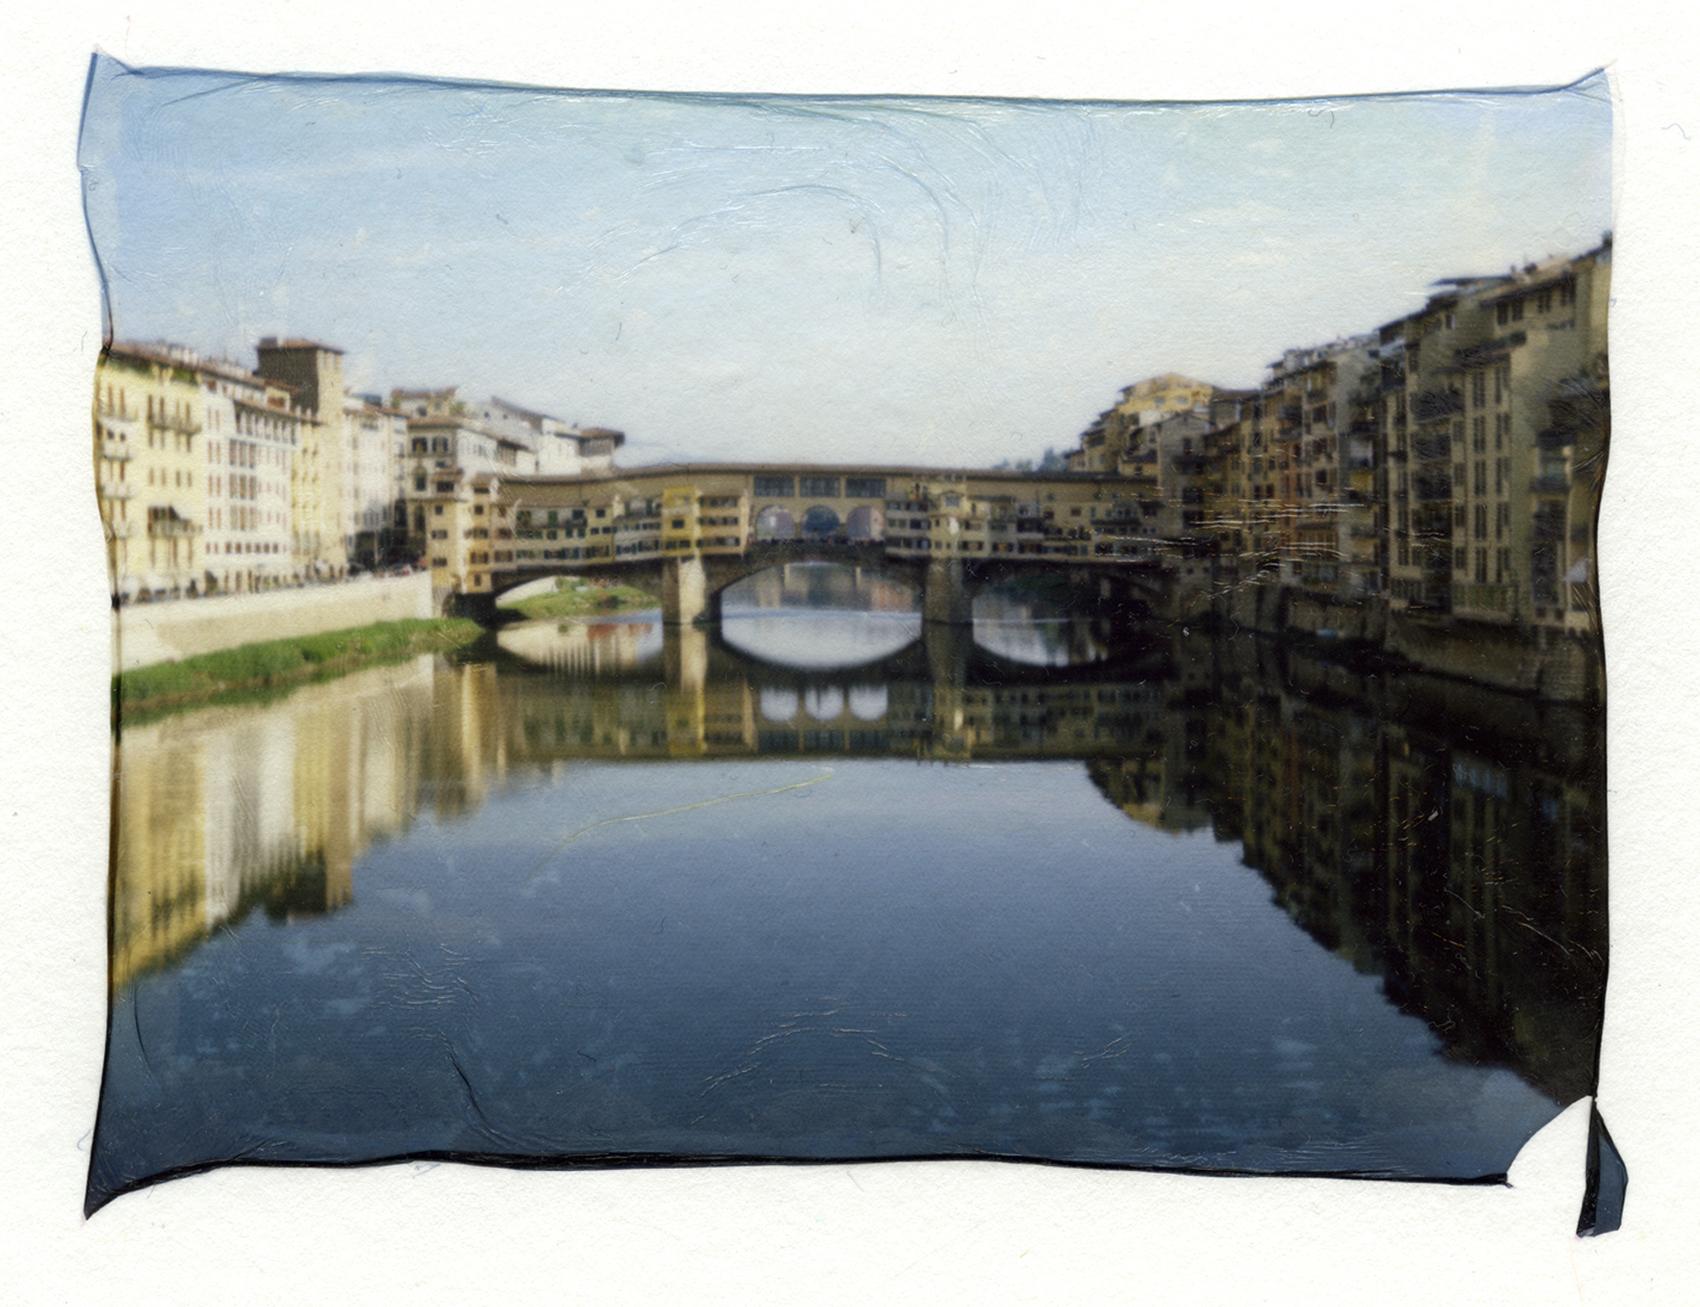 Ponte Vecchio, Florence, Italy | Polaroid Automatic 400 Land Camera | Fuji FP100C Silk Emulsion Lift | Barbara Justice